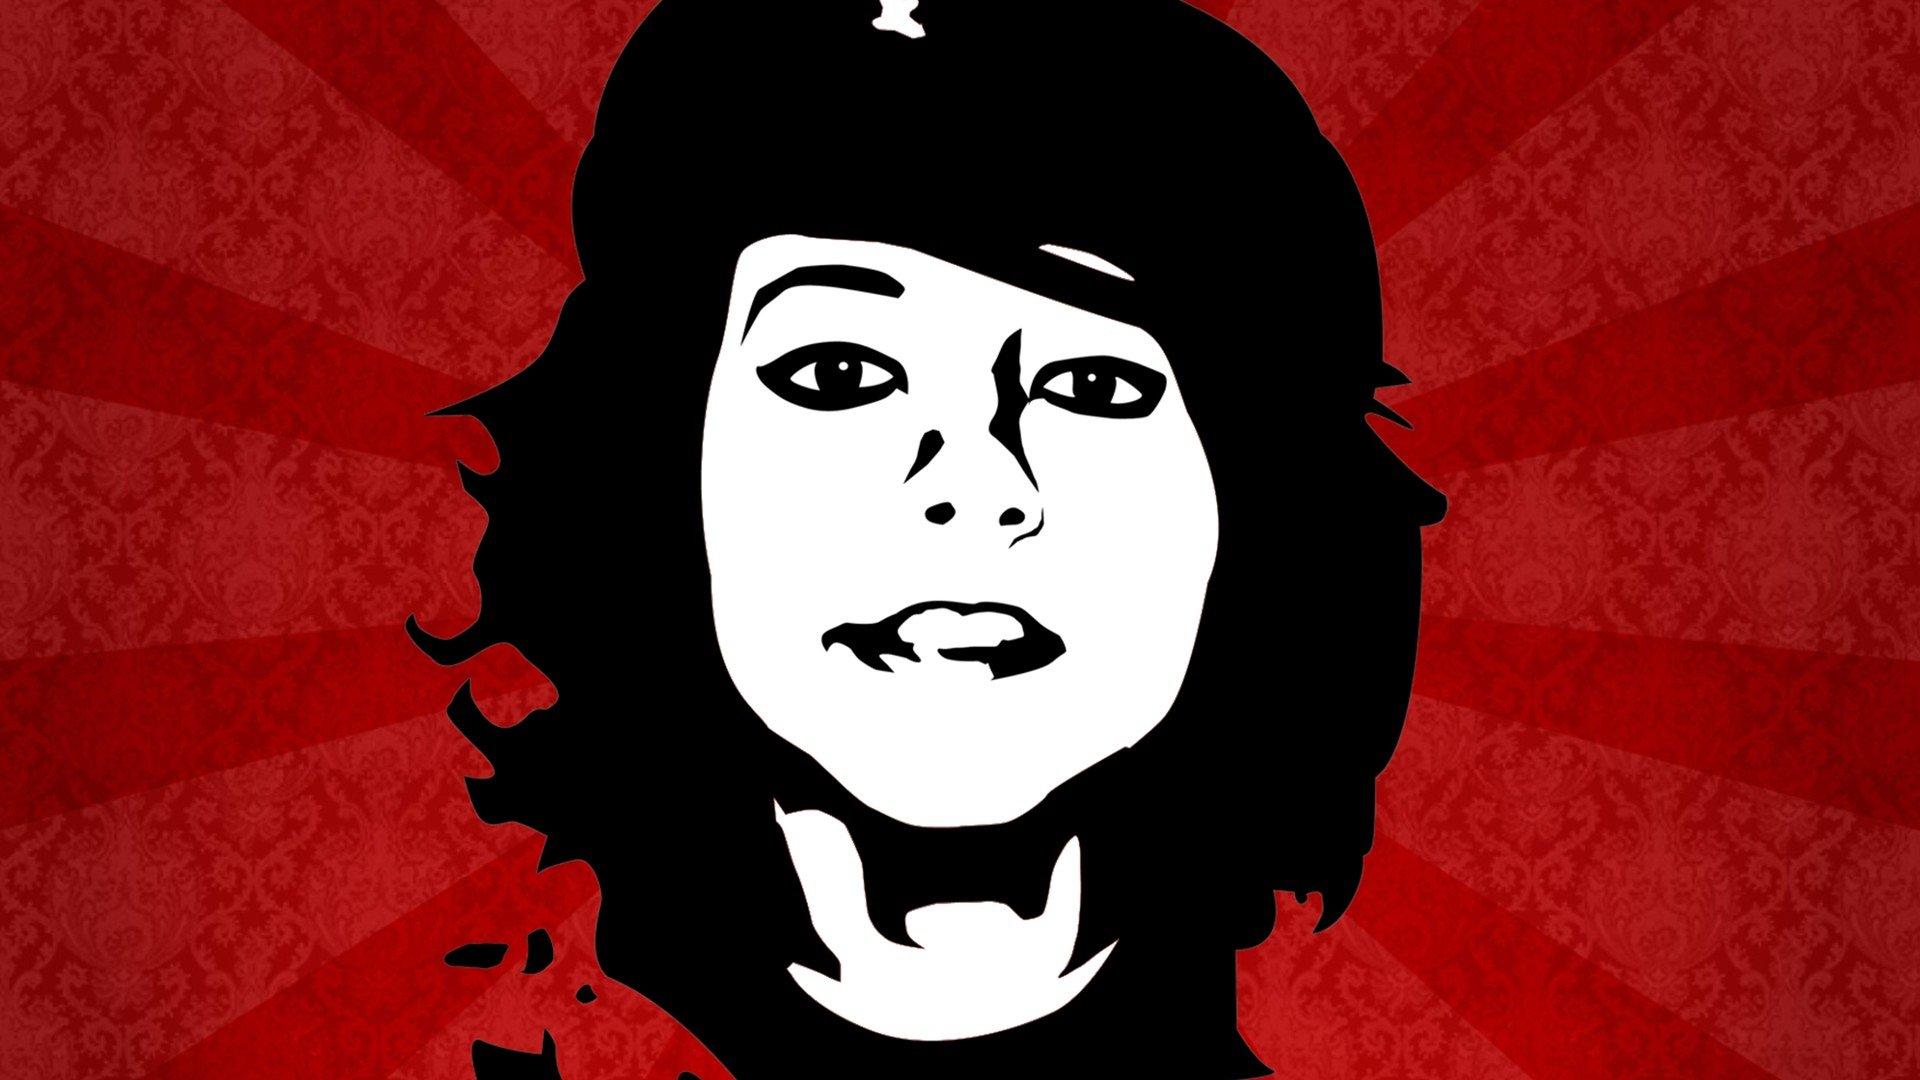 revolutionary, Boxxy, Che Guevara, Communism, Genderswap